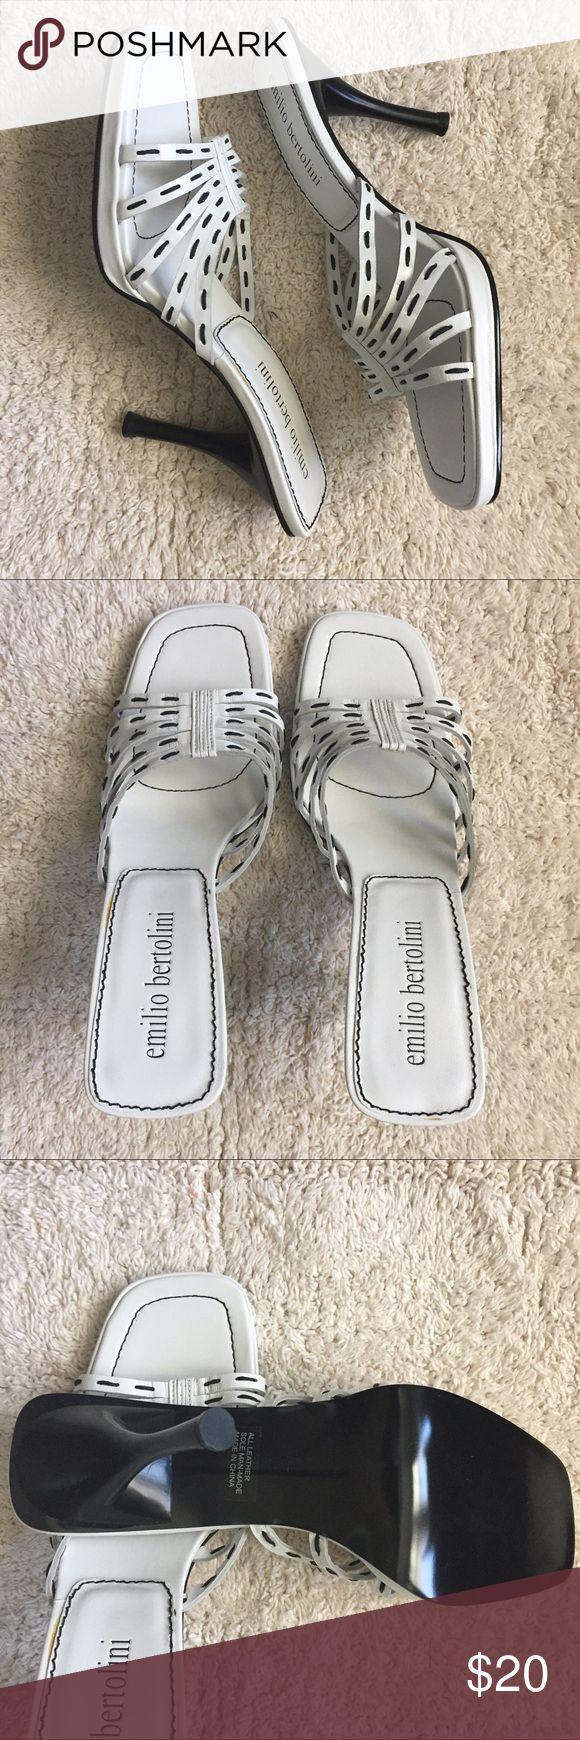 Emilio Bertolini leather high heel slide, size 8 Nice black and white leather slide heel sandal. Never worn. Emilio Bertolini Shoes Heels